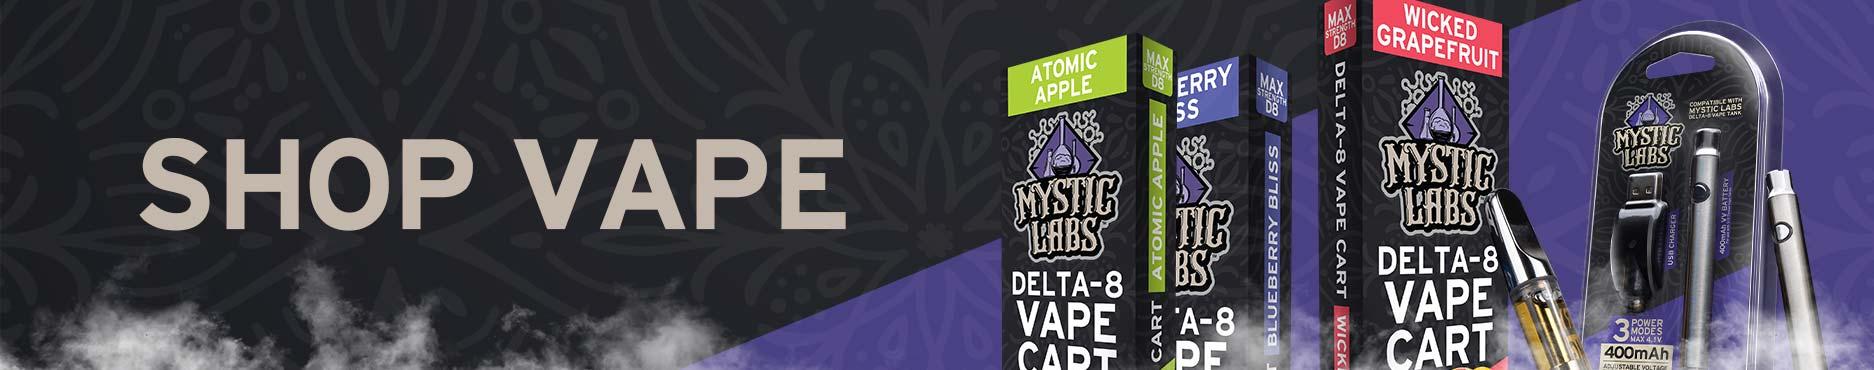 Delta-8 Vape Juice